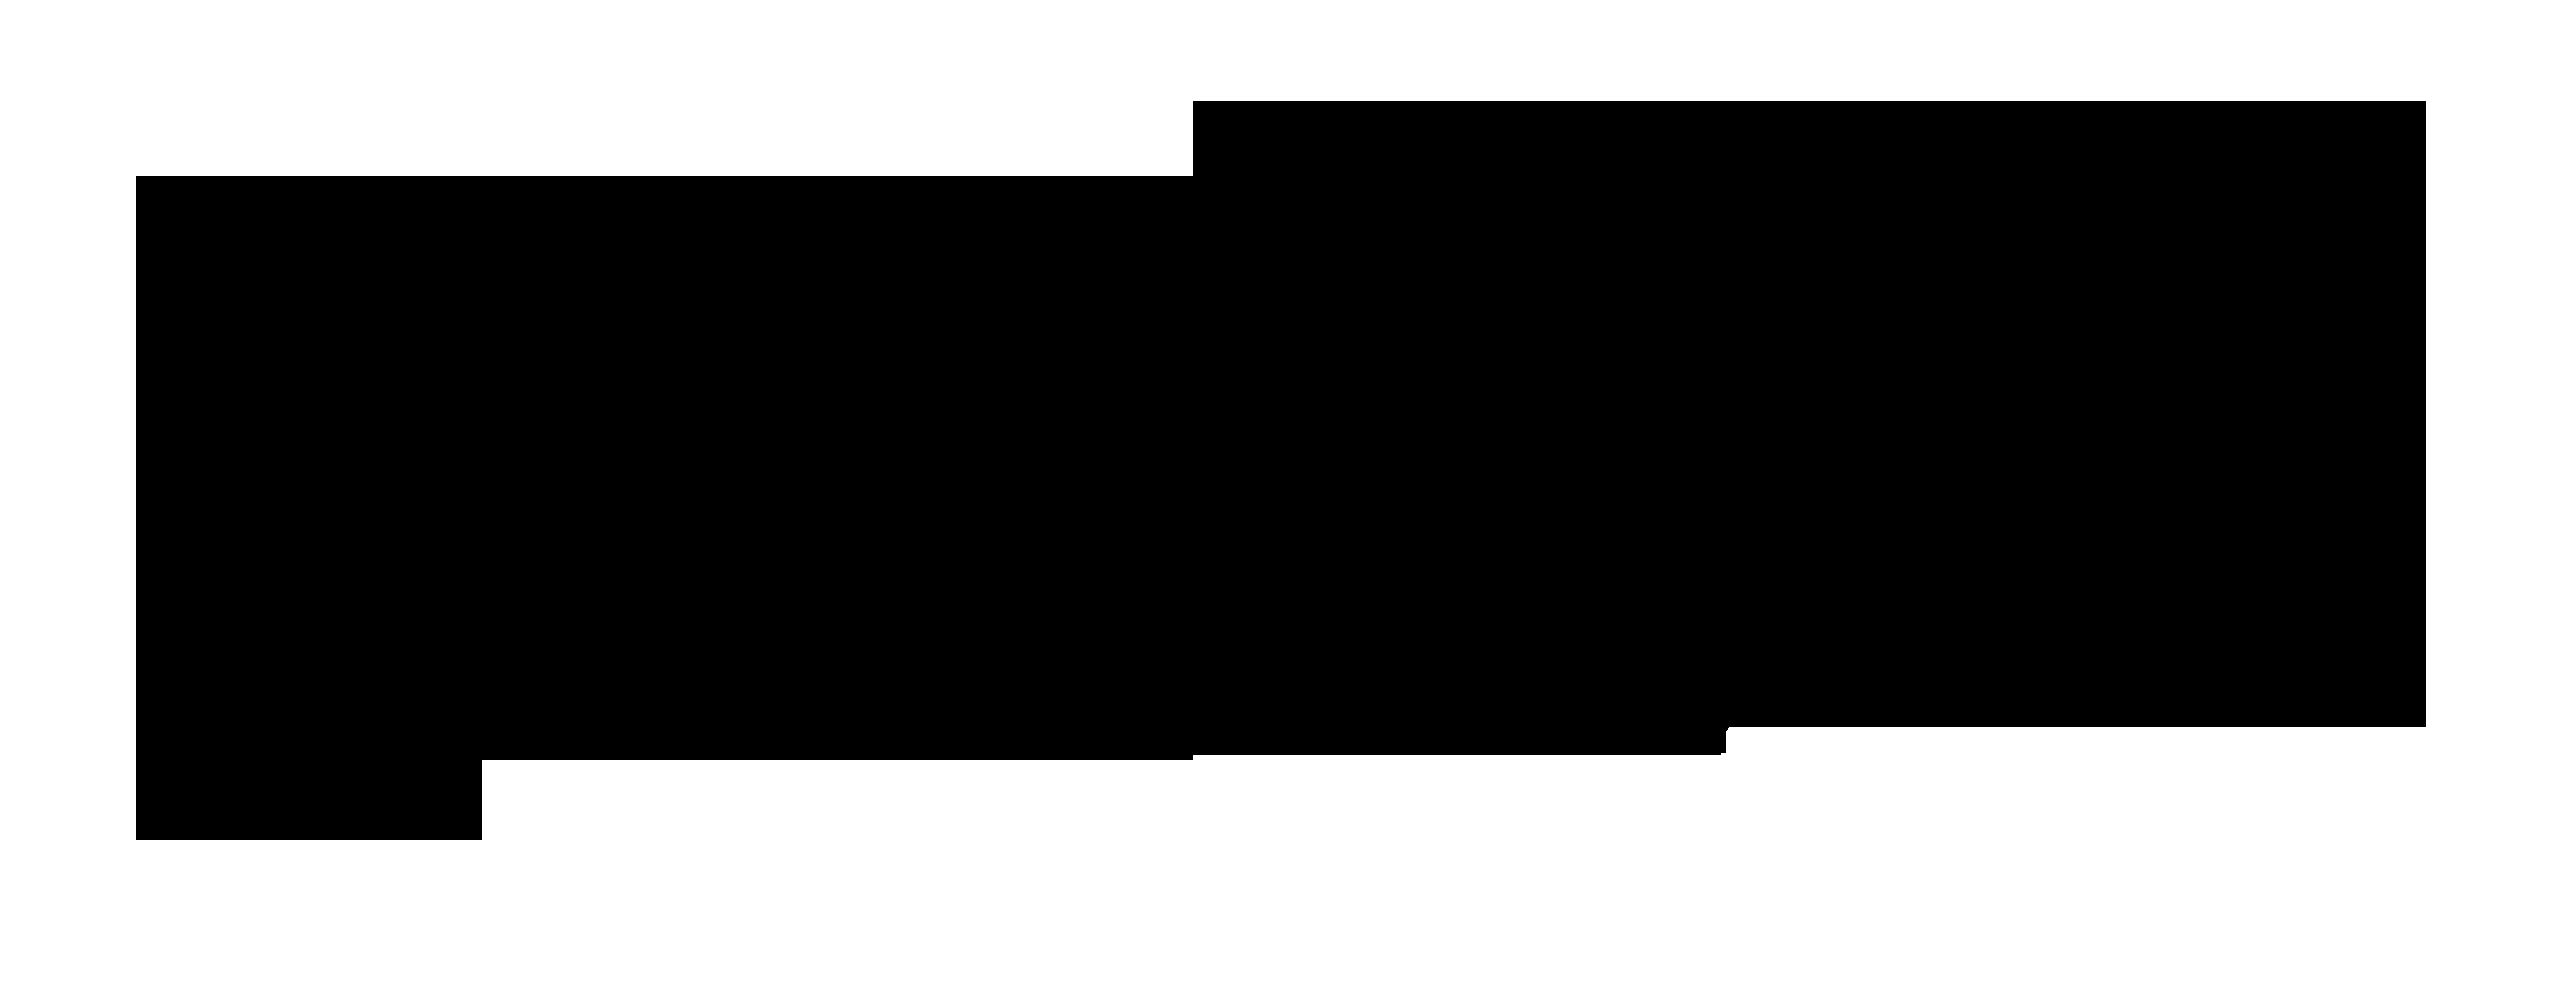 michele cammariere logo